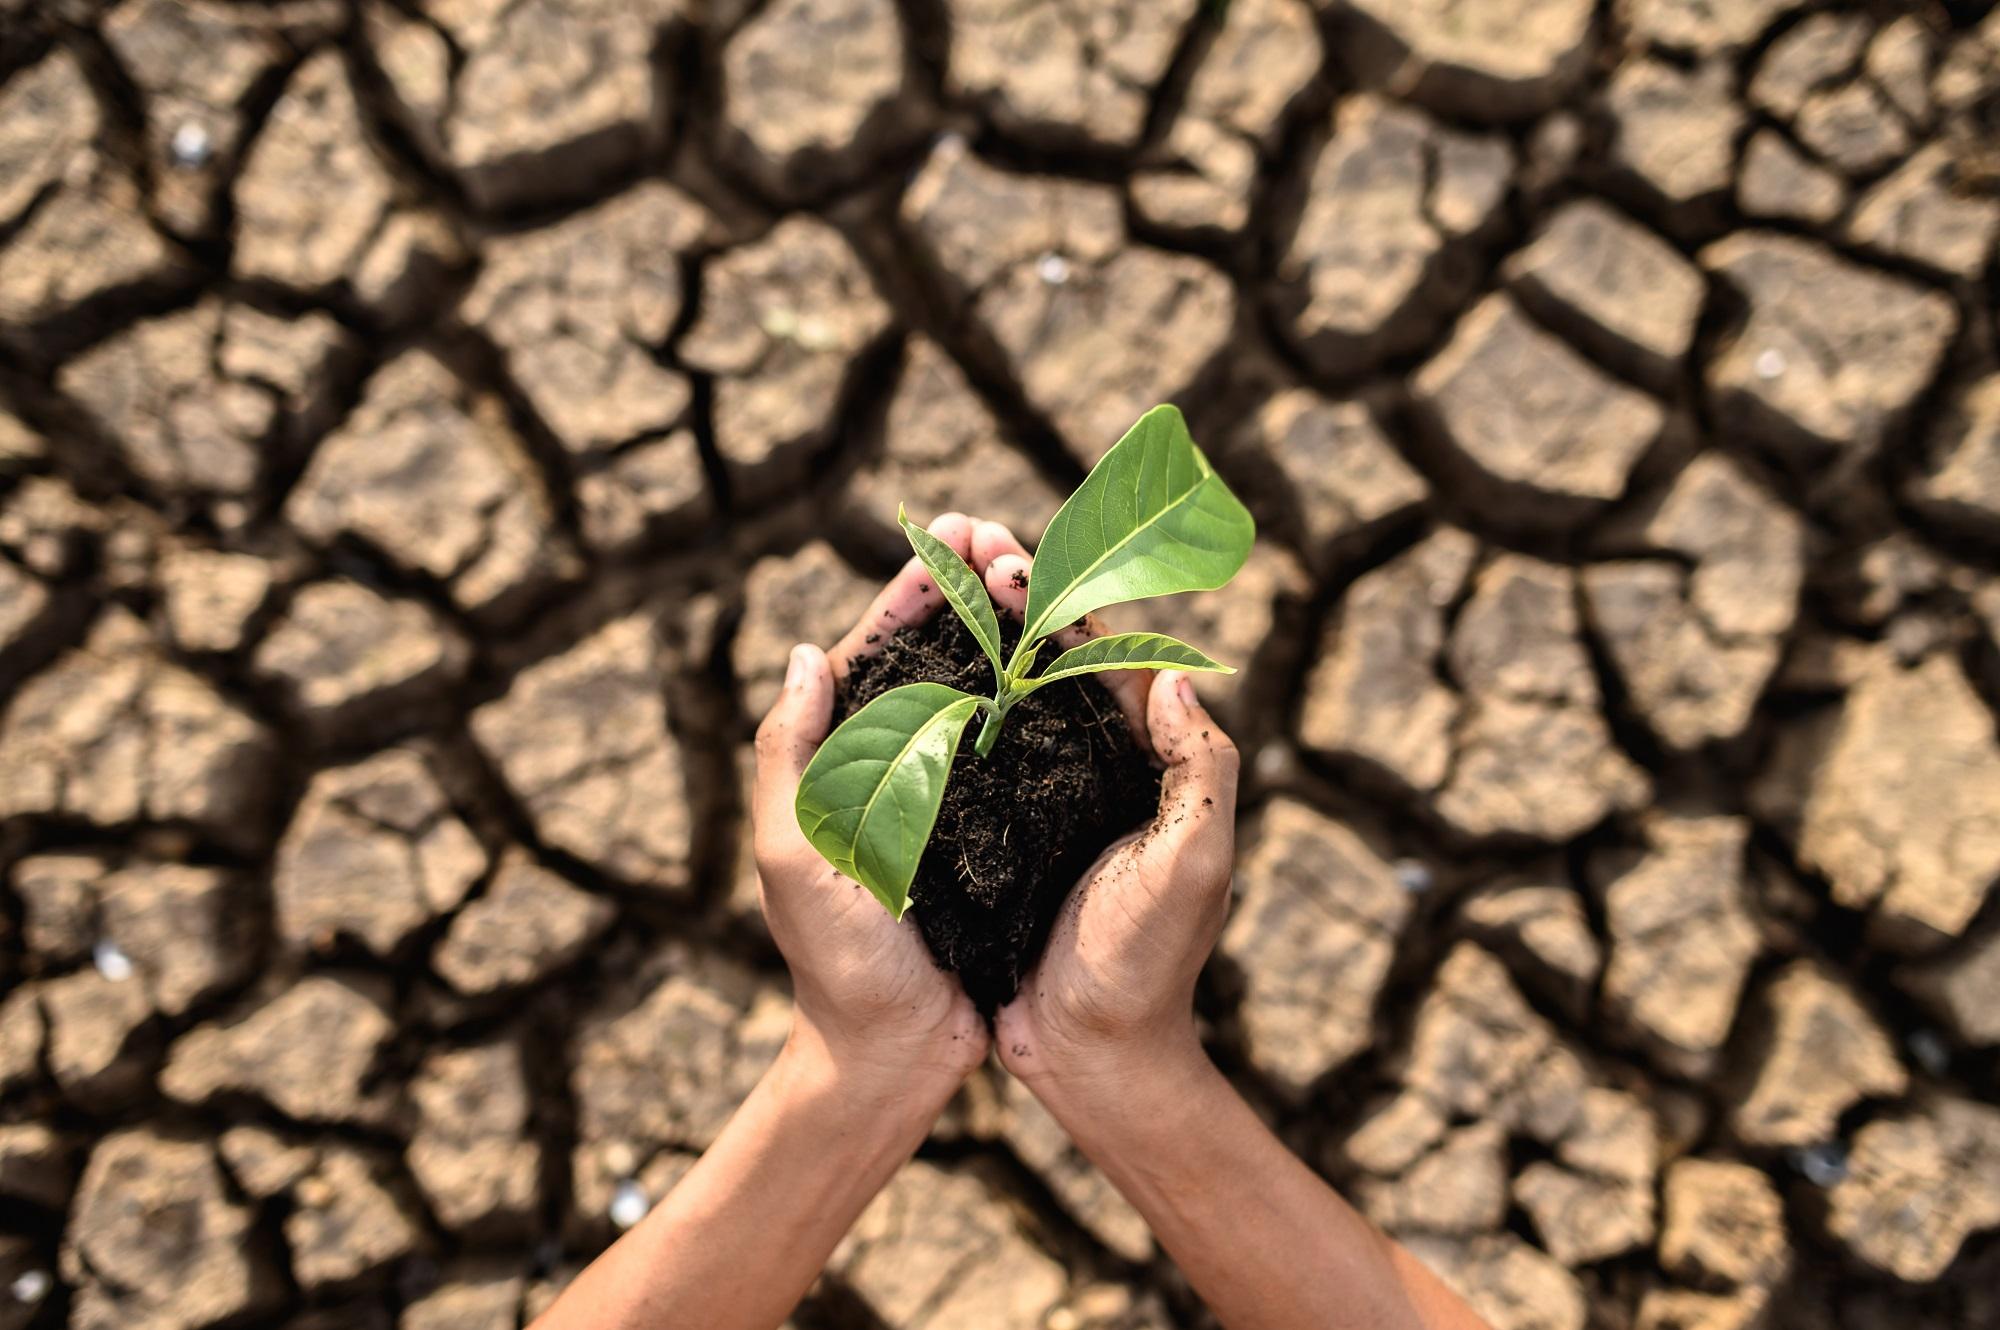 sucho, erozia, kompost, bioodpad